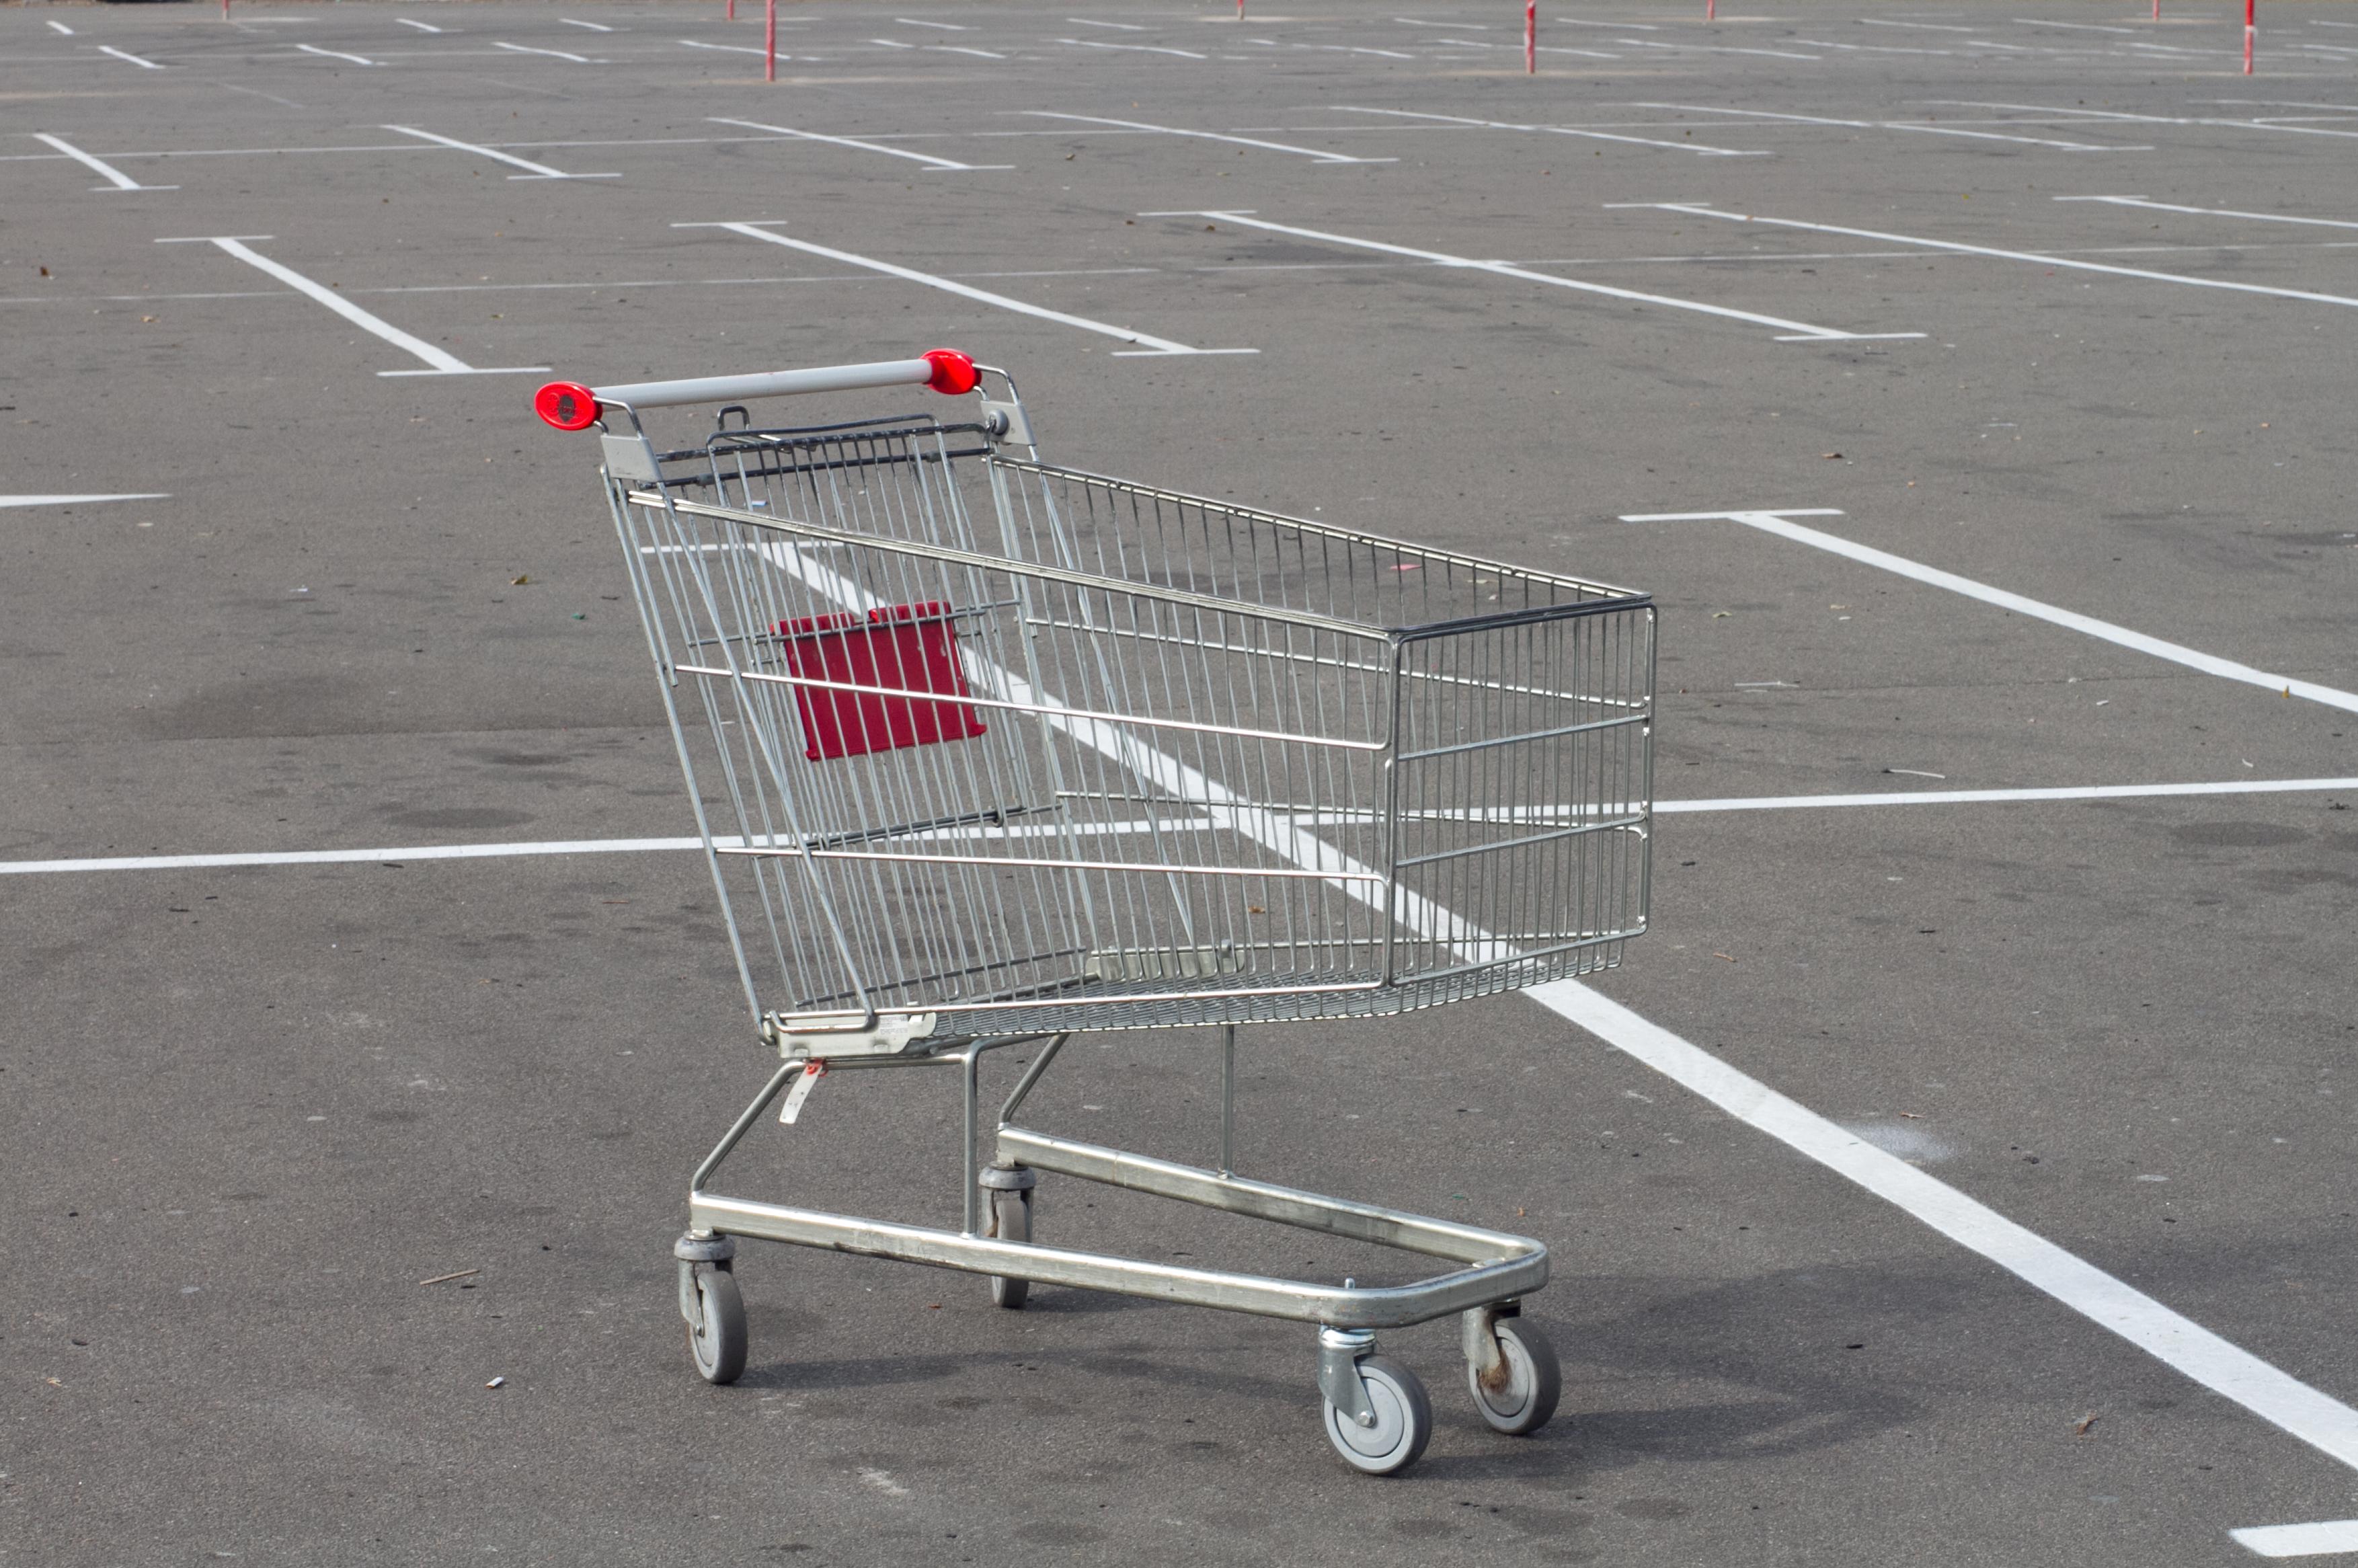 An empty shopping cart sitting in an empty parking lot.